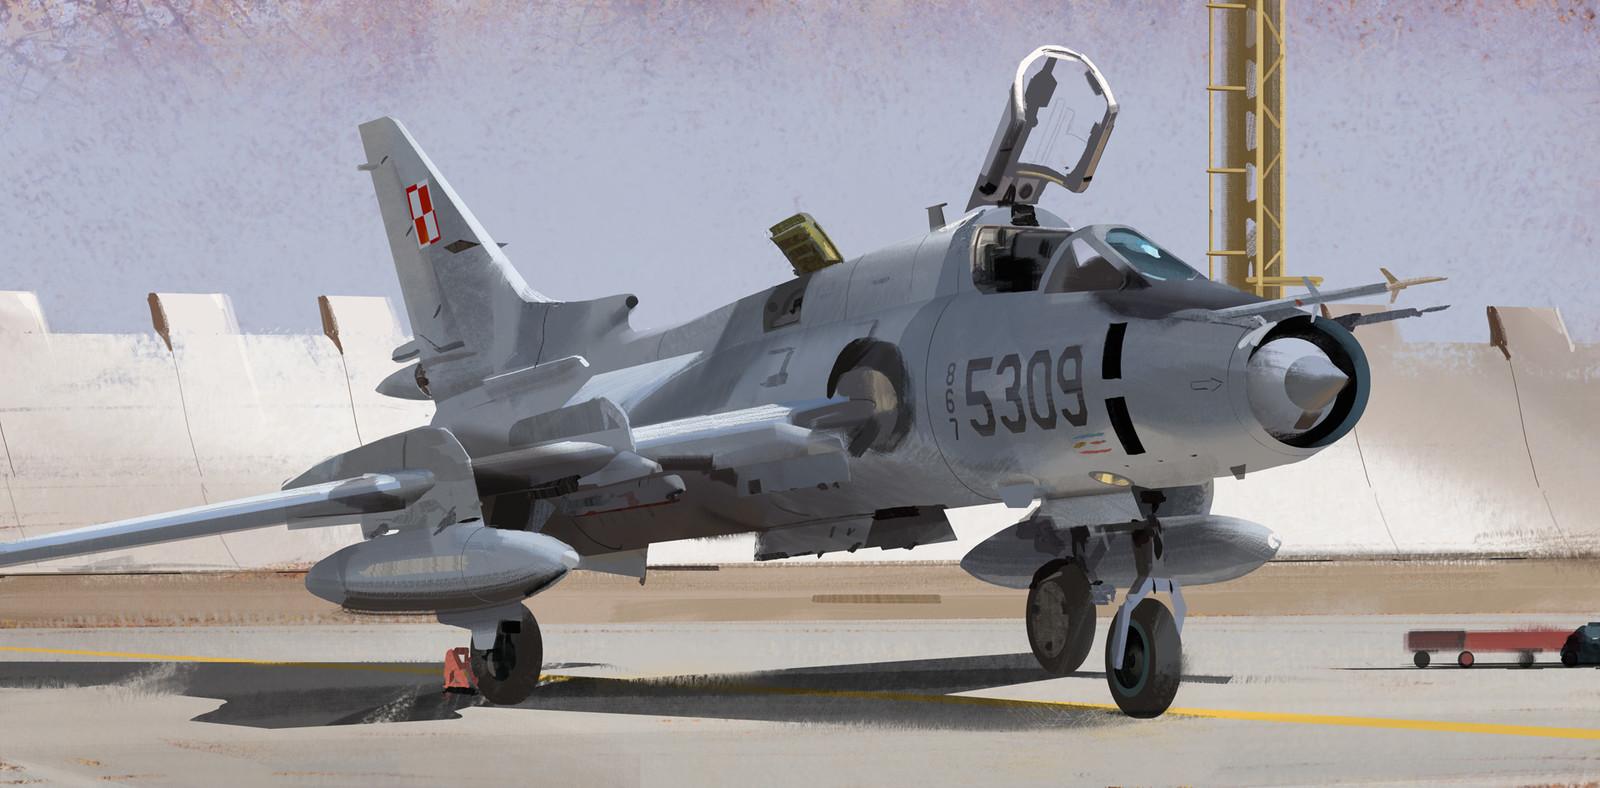 SU-22 Runway Study